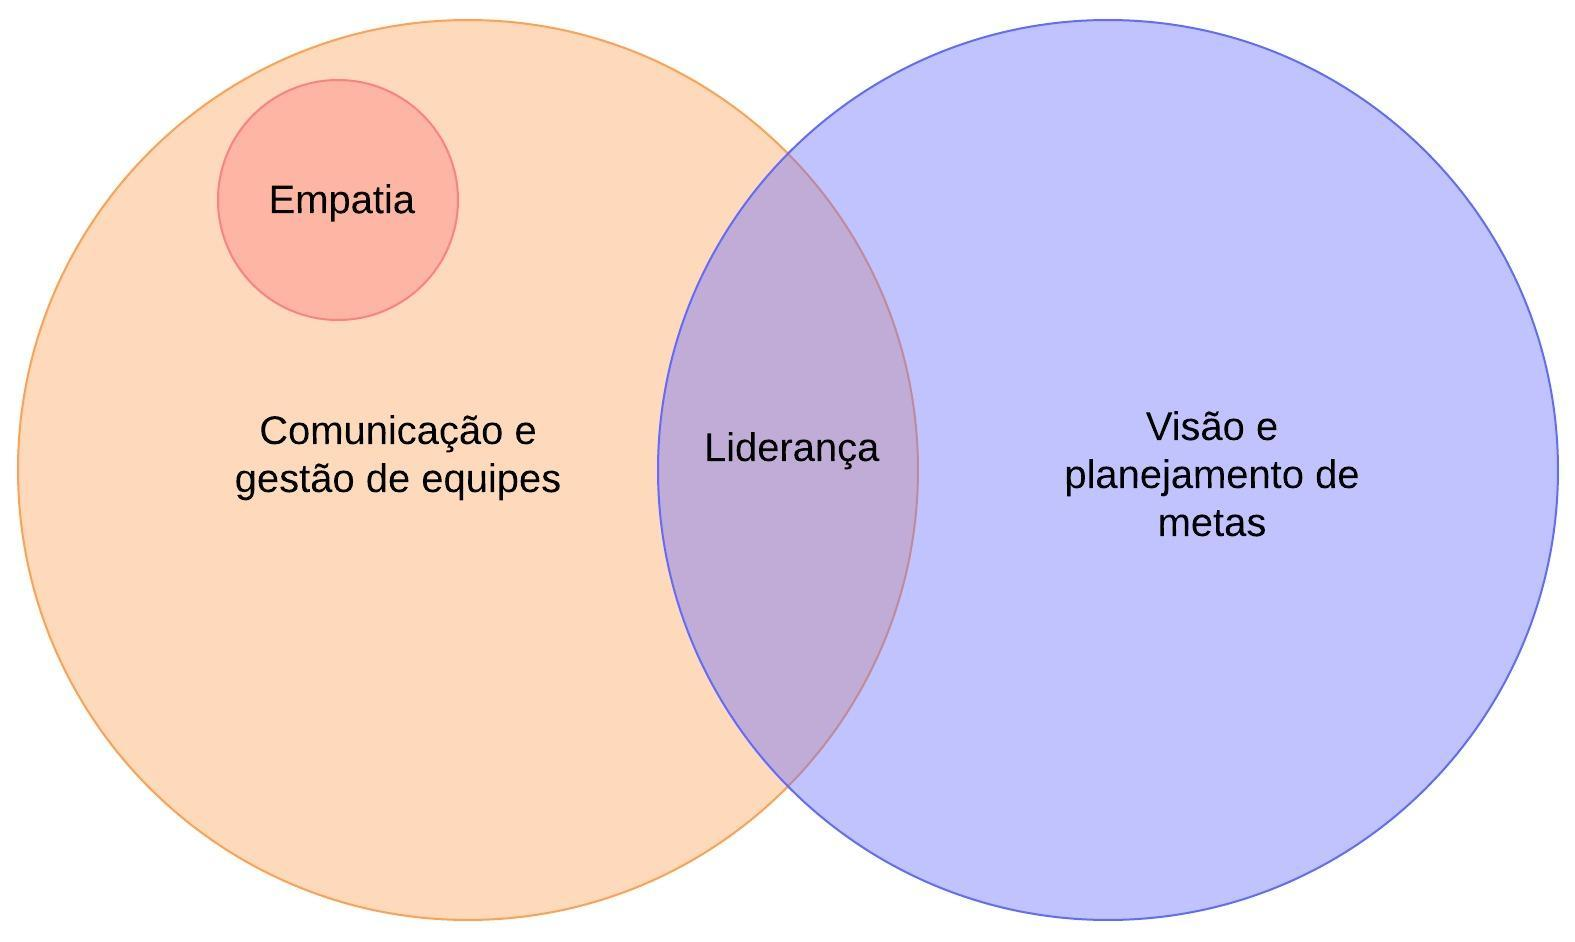 Exemplo de diagrama de Venn com 3 conjuntos